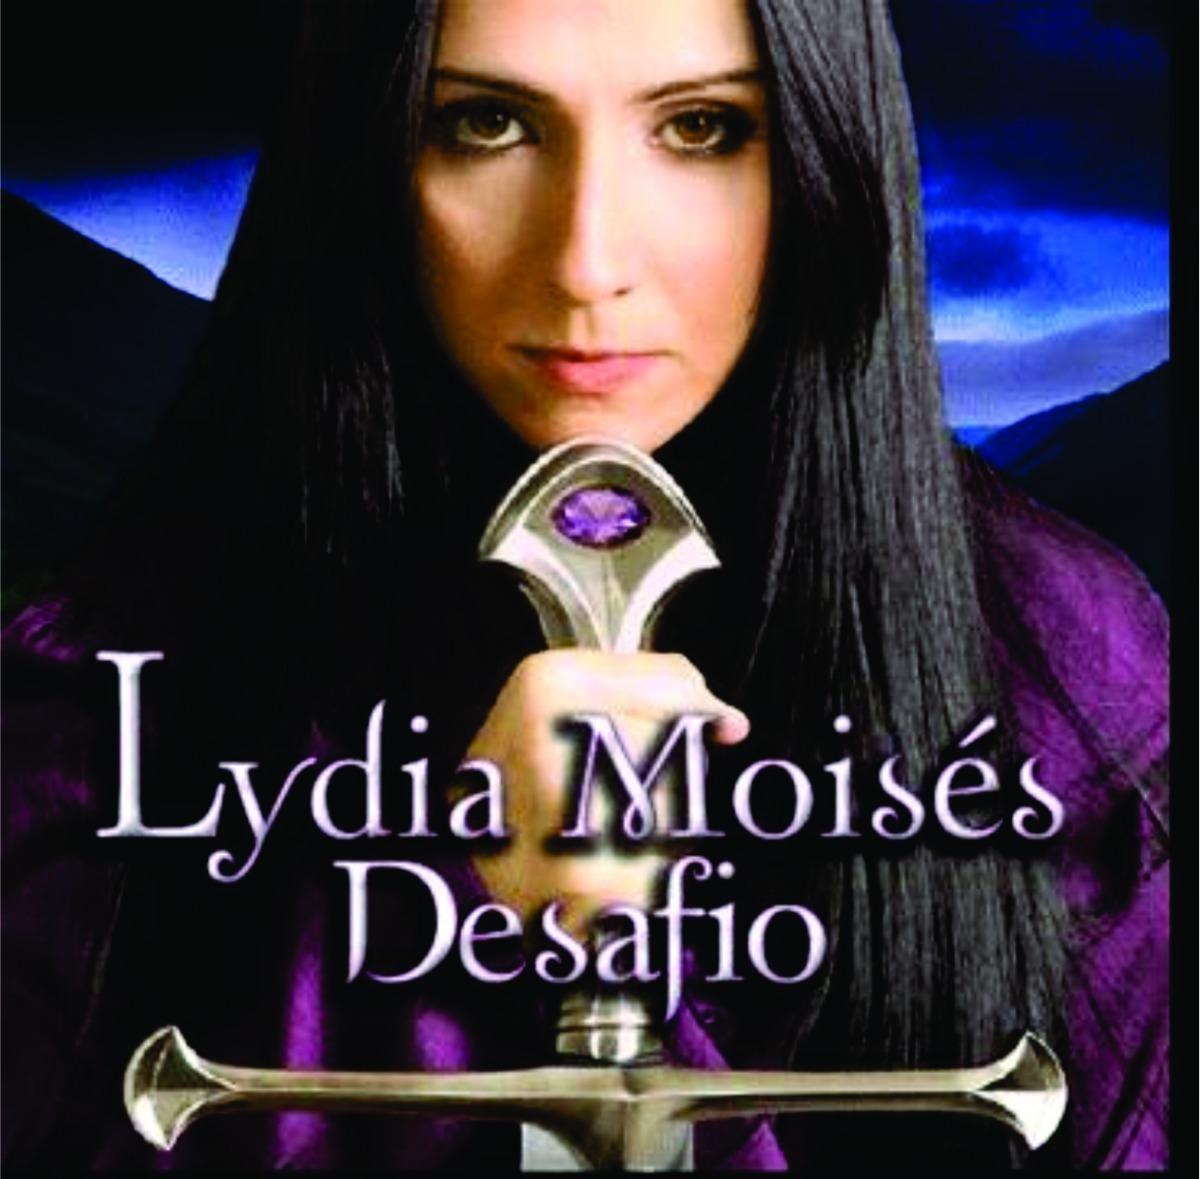 gratis cd desafio lydia moises